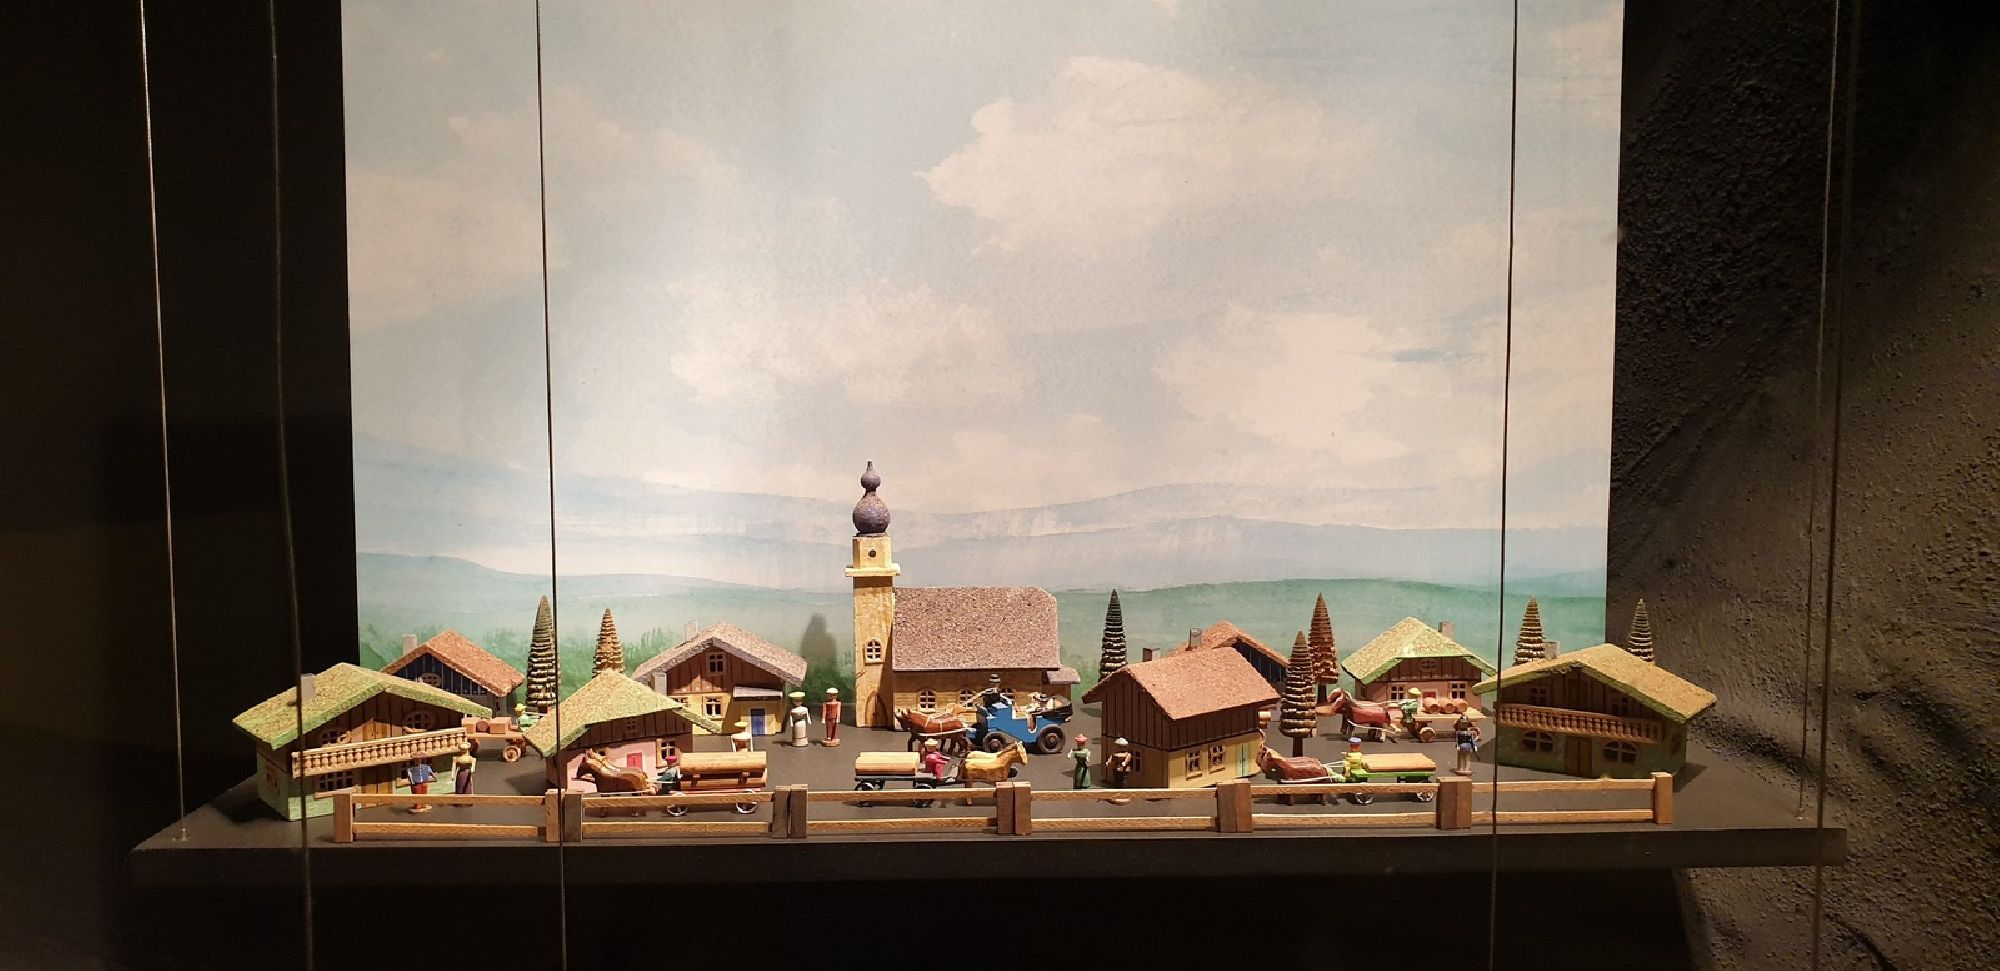 Miniaturen-Schnitzkunst